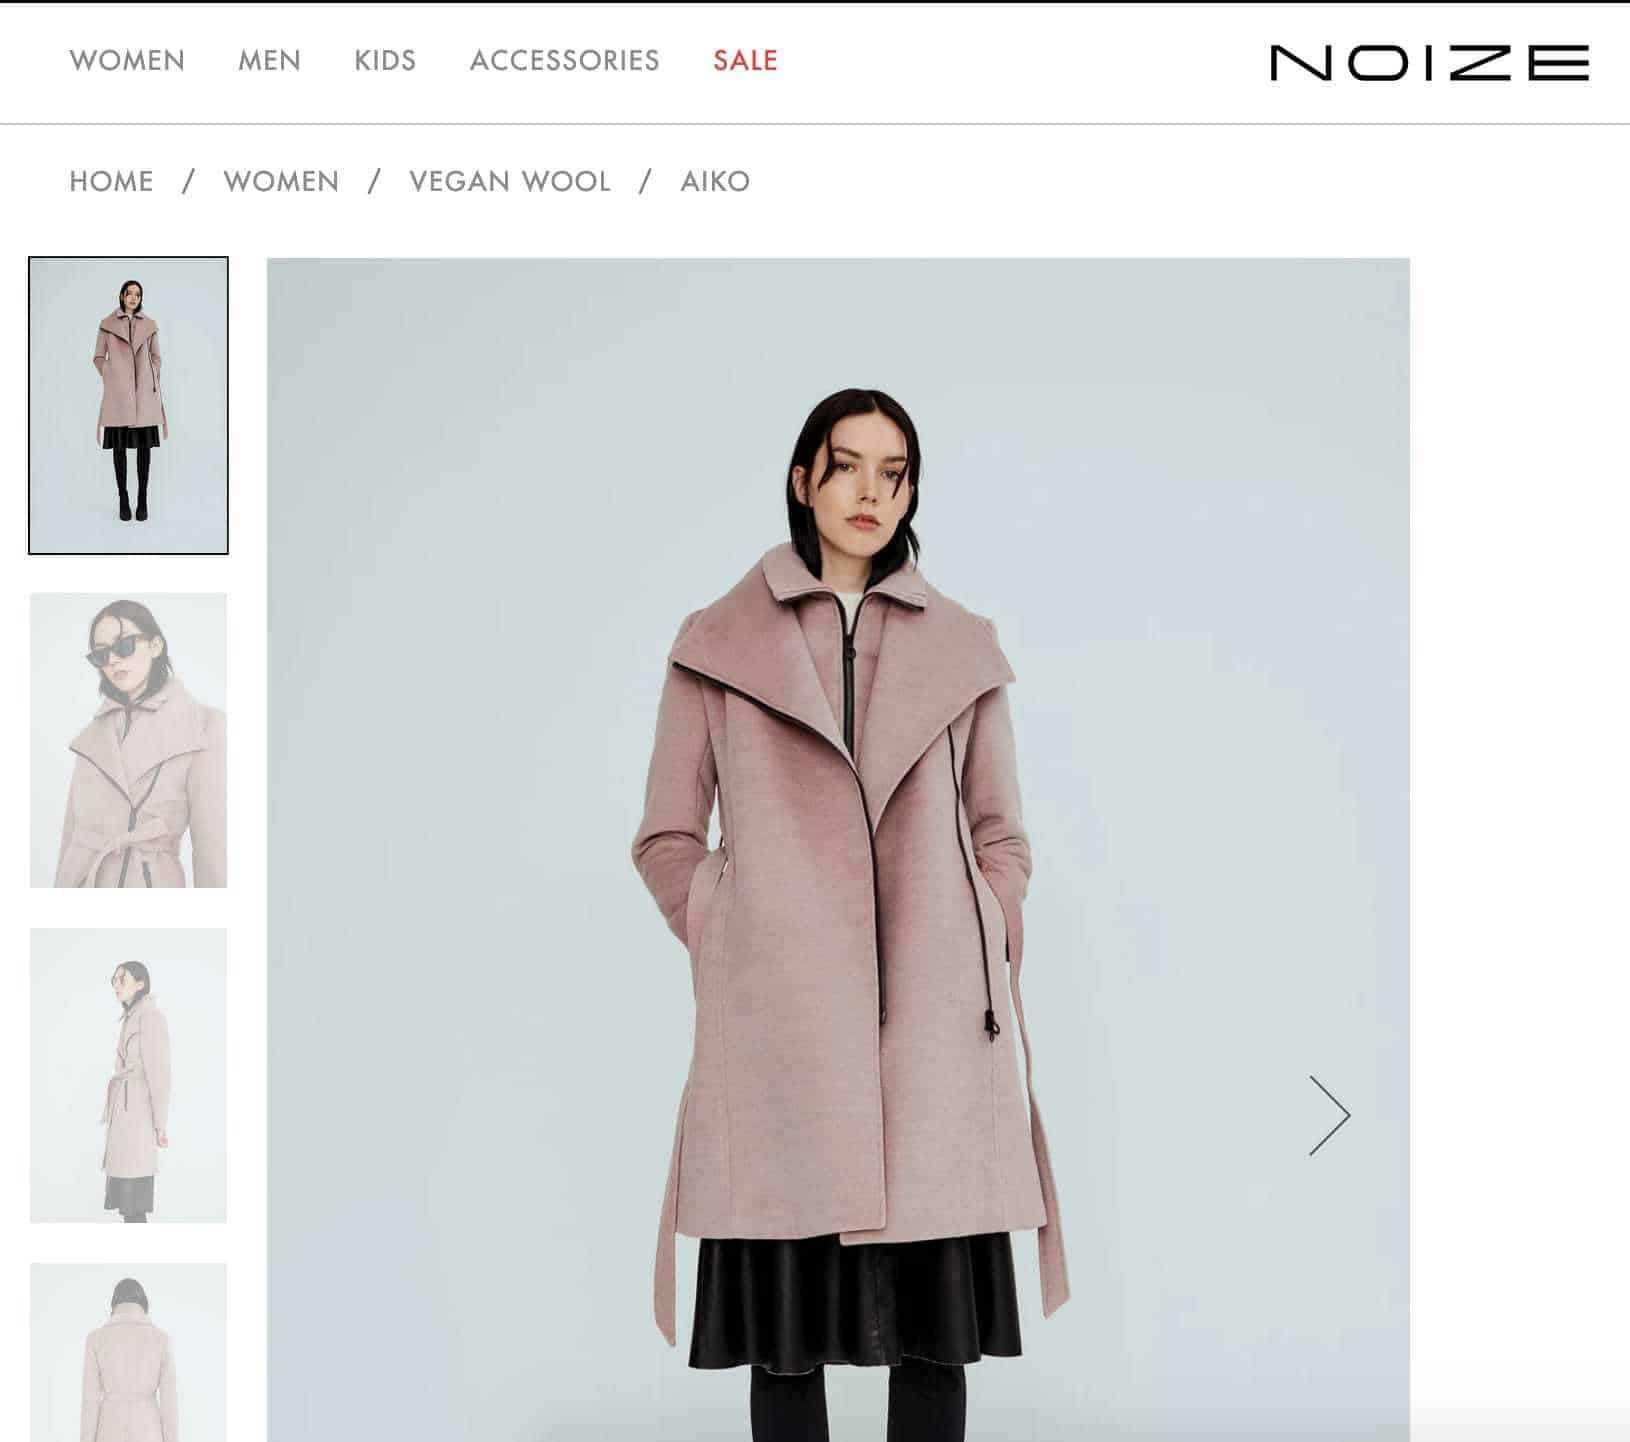 Girl wearing long, pink coat, unbelted